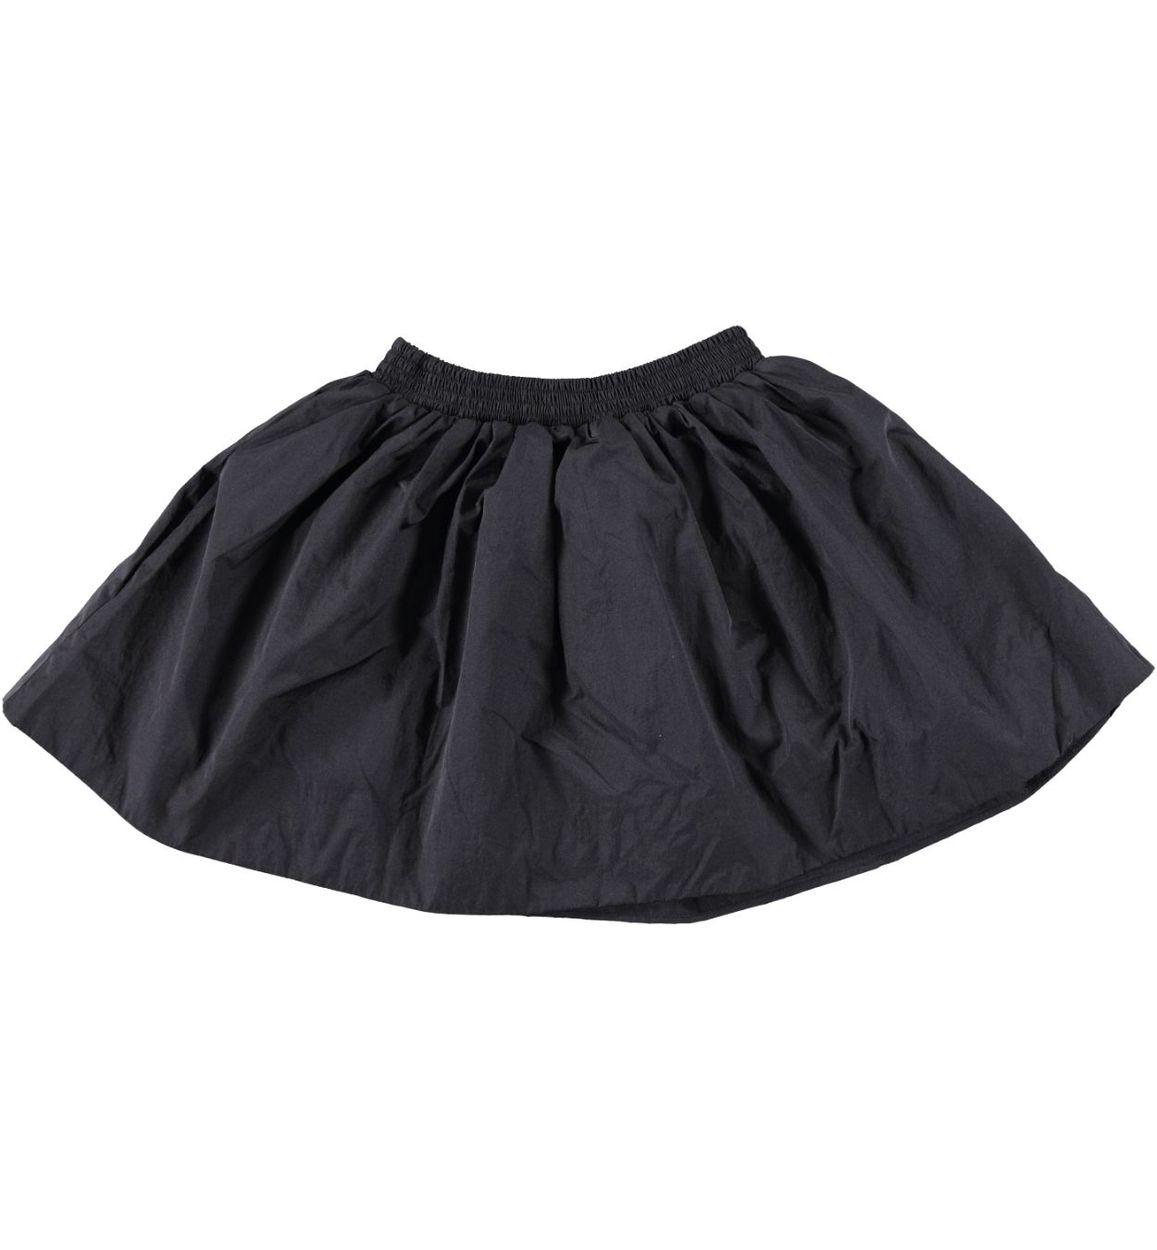 sale retailer f39dc 0945b Elegante gonna a palloncino per bambina da 3 a 16 anni iDO